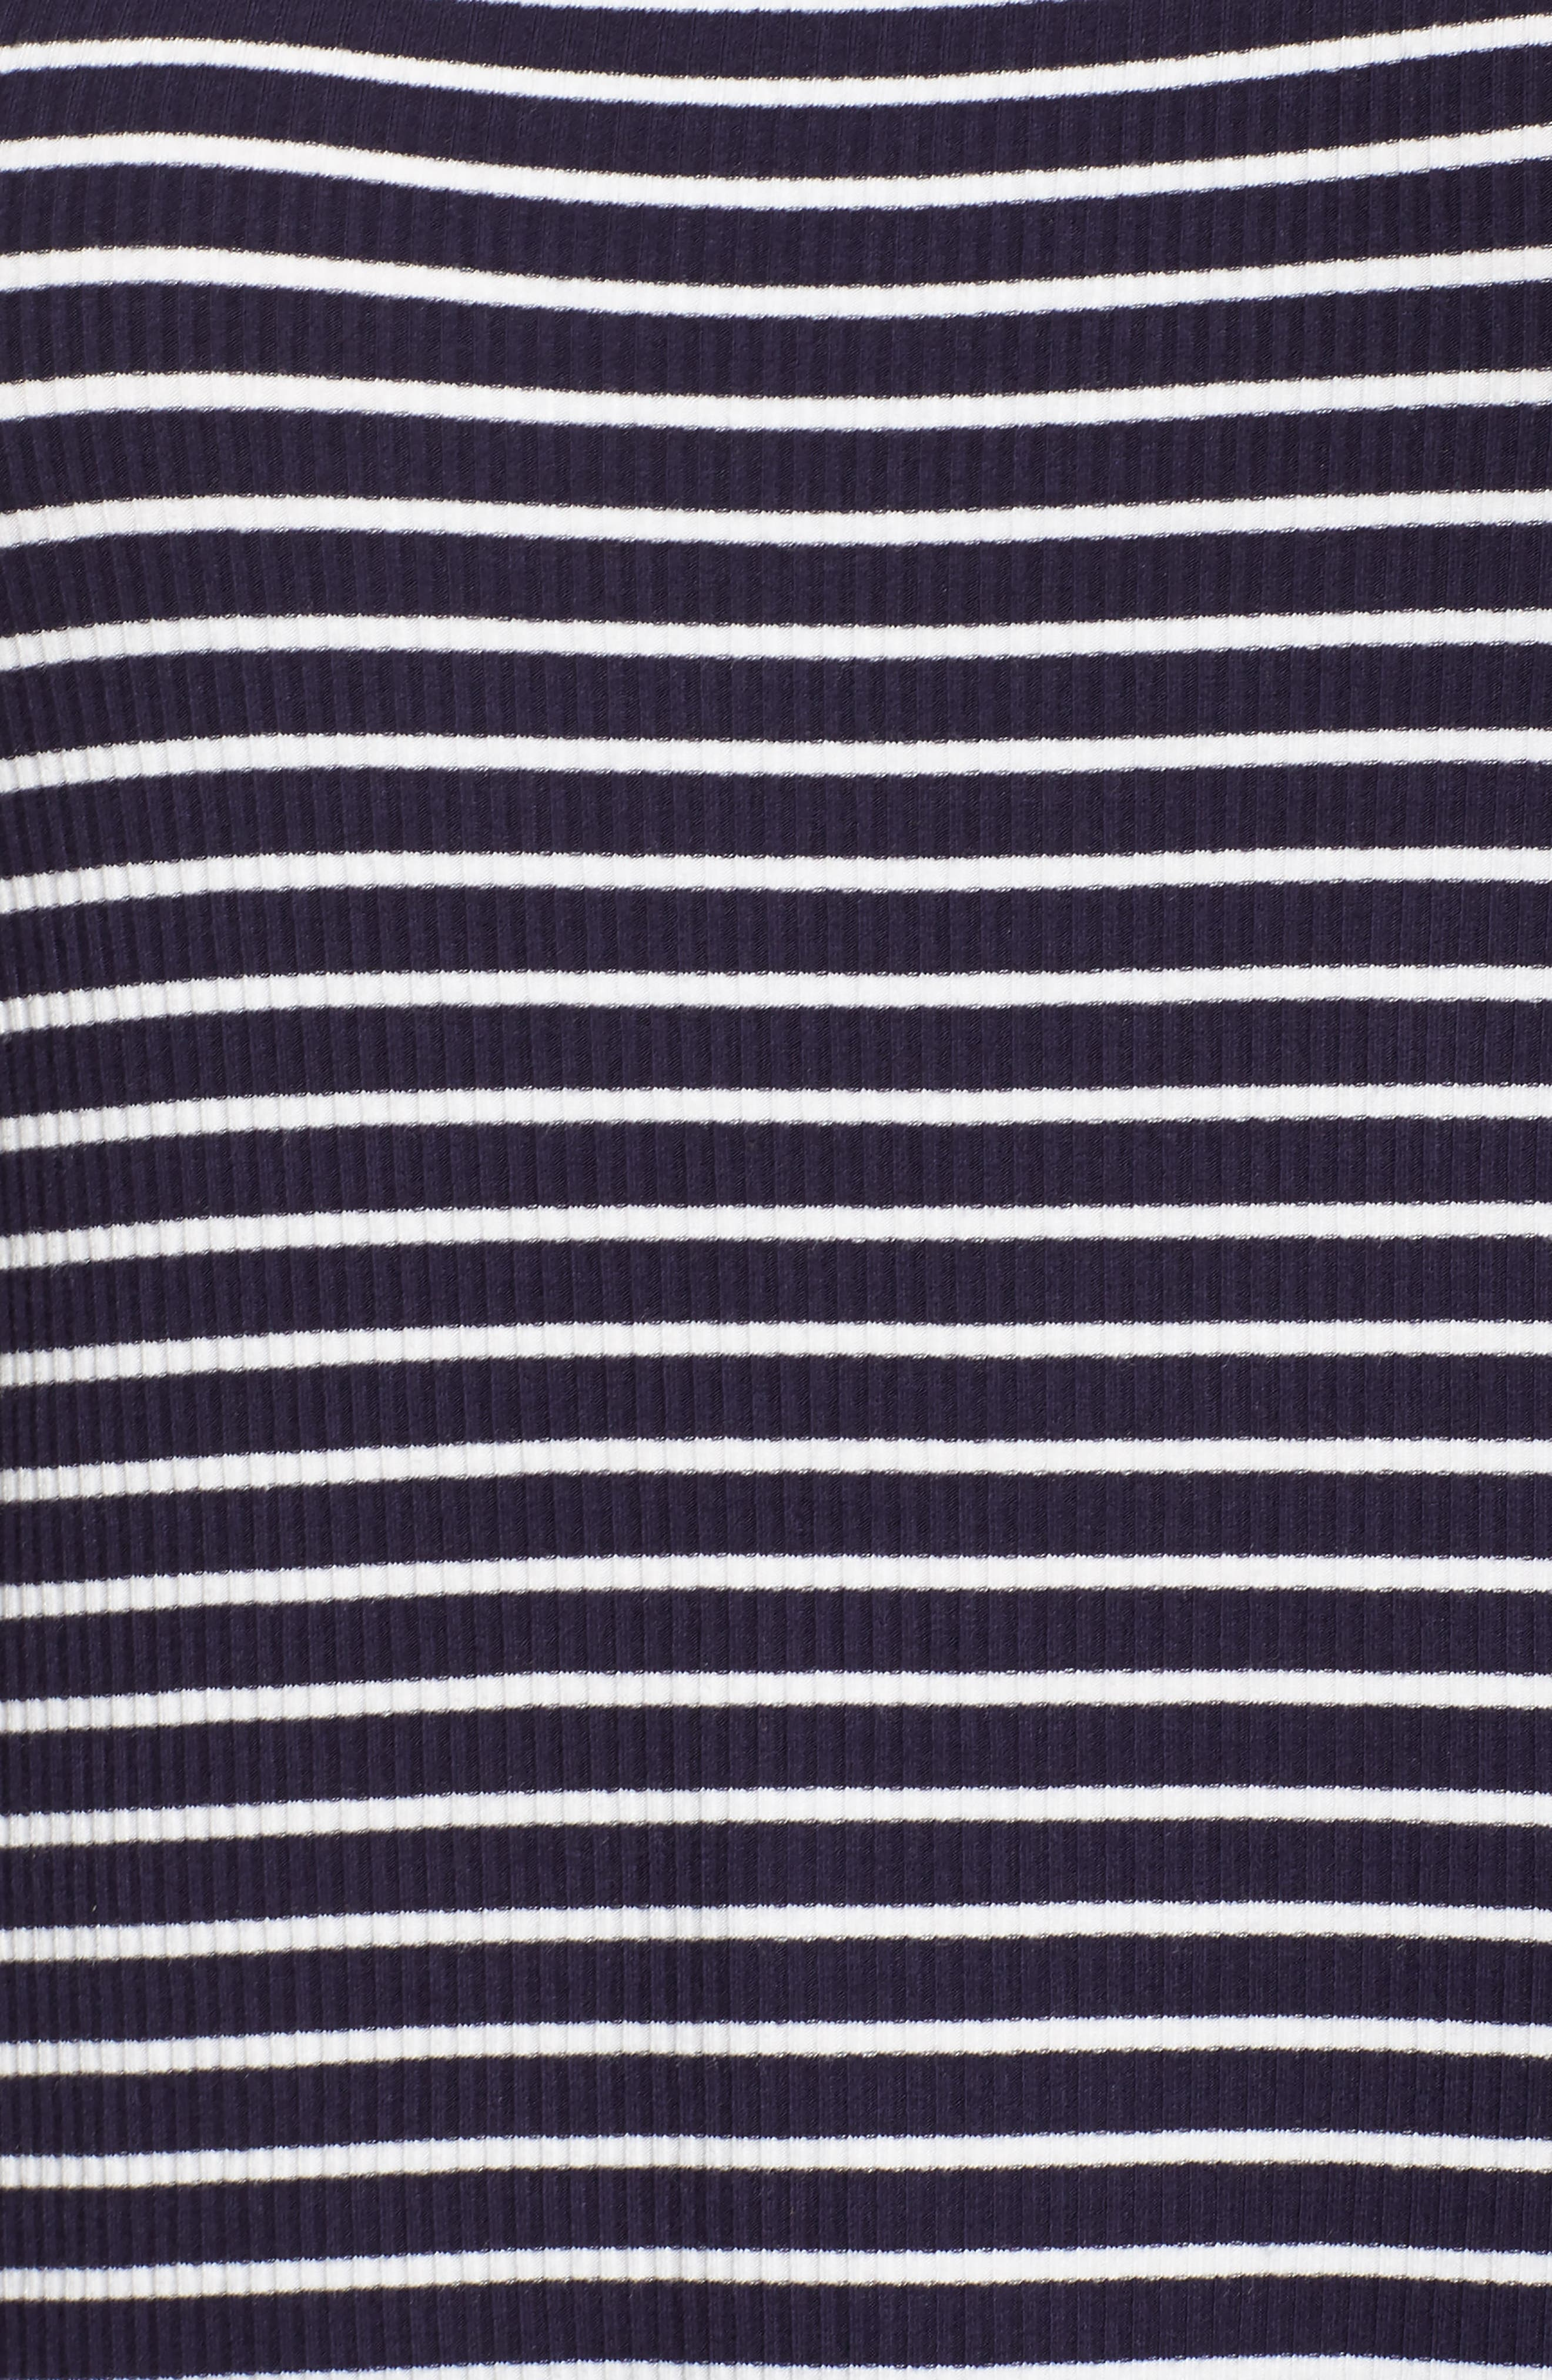 Scoop Neck Long Sleeve Tee,                             Alternate thumbnail 5, color,                             Navy- White Stripe